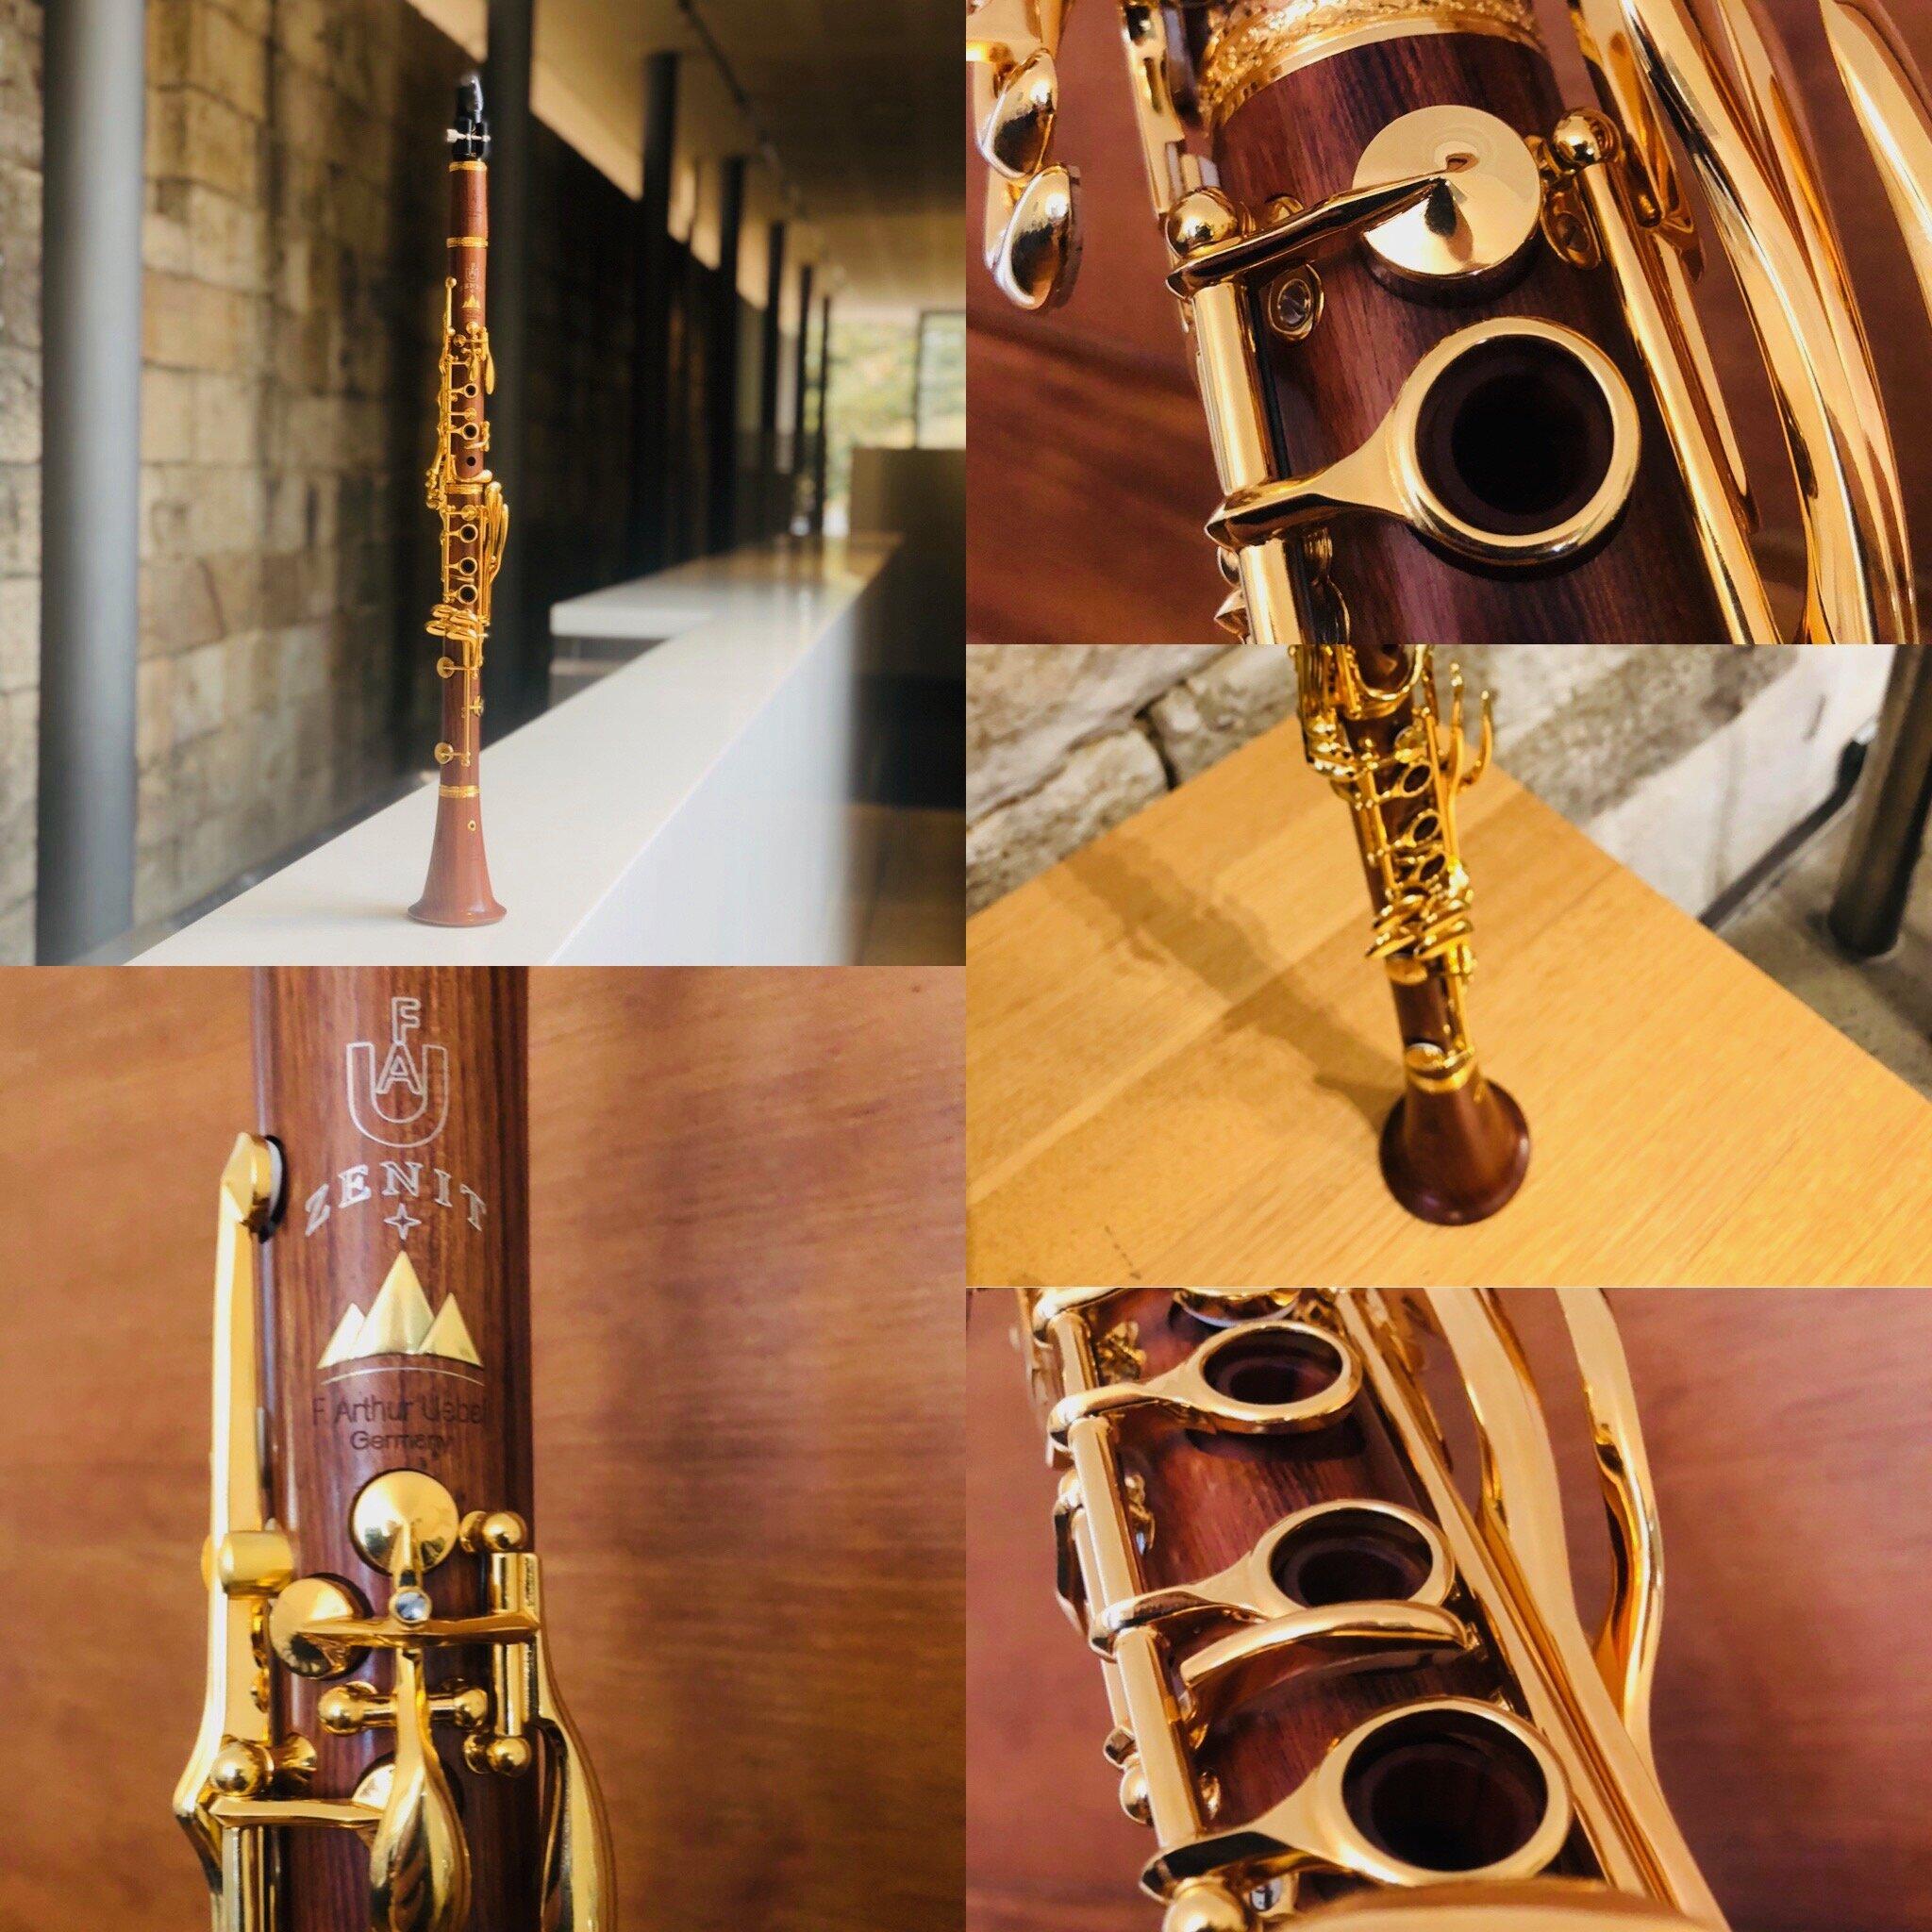 F.Arthur Uebel Zenit 24K Mopane Bb Clarinet